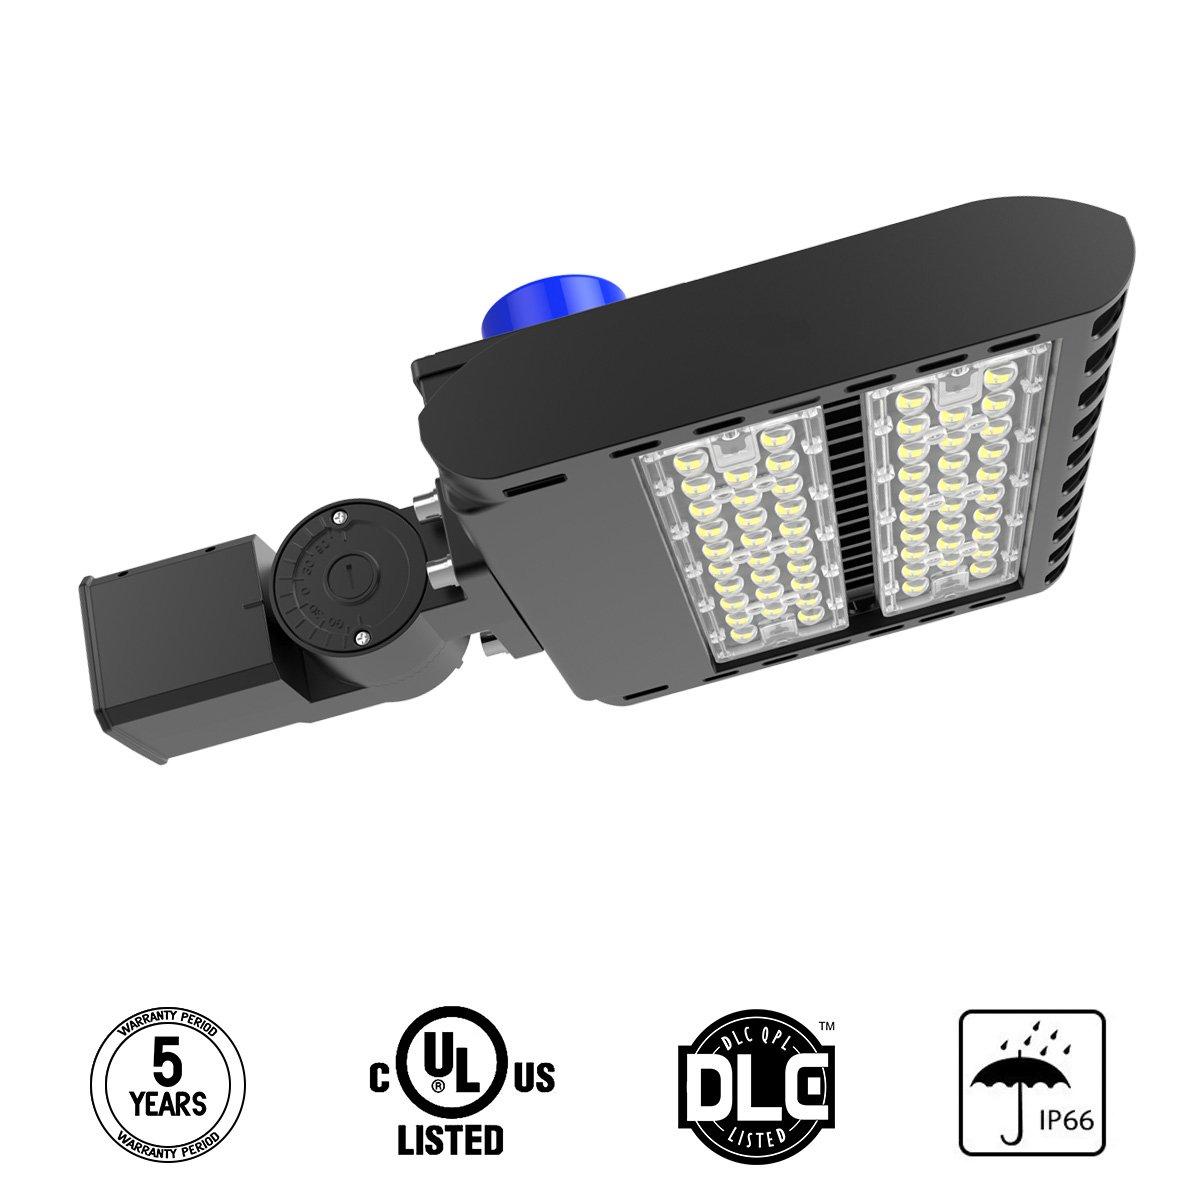 LED Parking Lot Light, 100W Street Area Light Lumileds SMD 3030 LED 130 Lm/W Daylight 5700K Bright White Light with Photocell Sensor&Shorting Circuit Cap, 3-Type Mounts Adiding IP66 UL DLC Listed